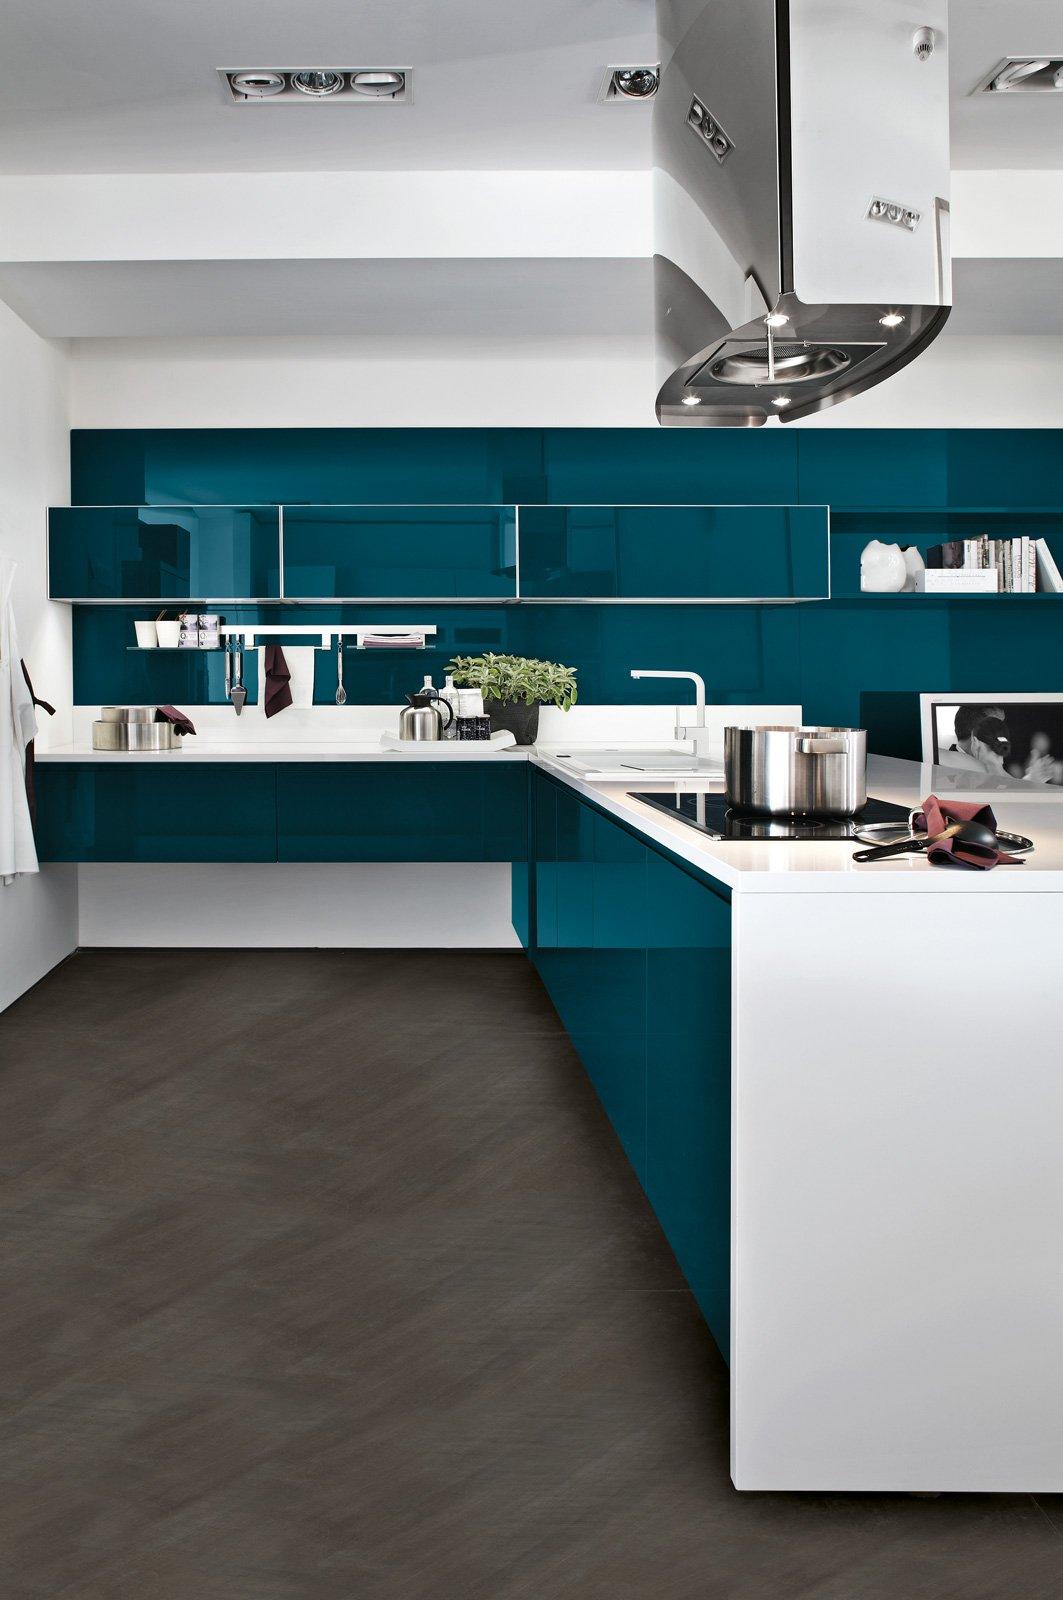 Cappe in acciaio per cucine best cappa aspirante acciaio - Motore cappa aspirante cucina ...